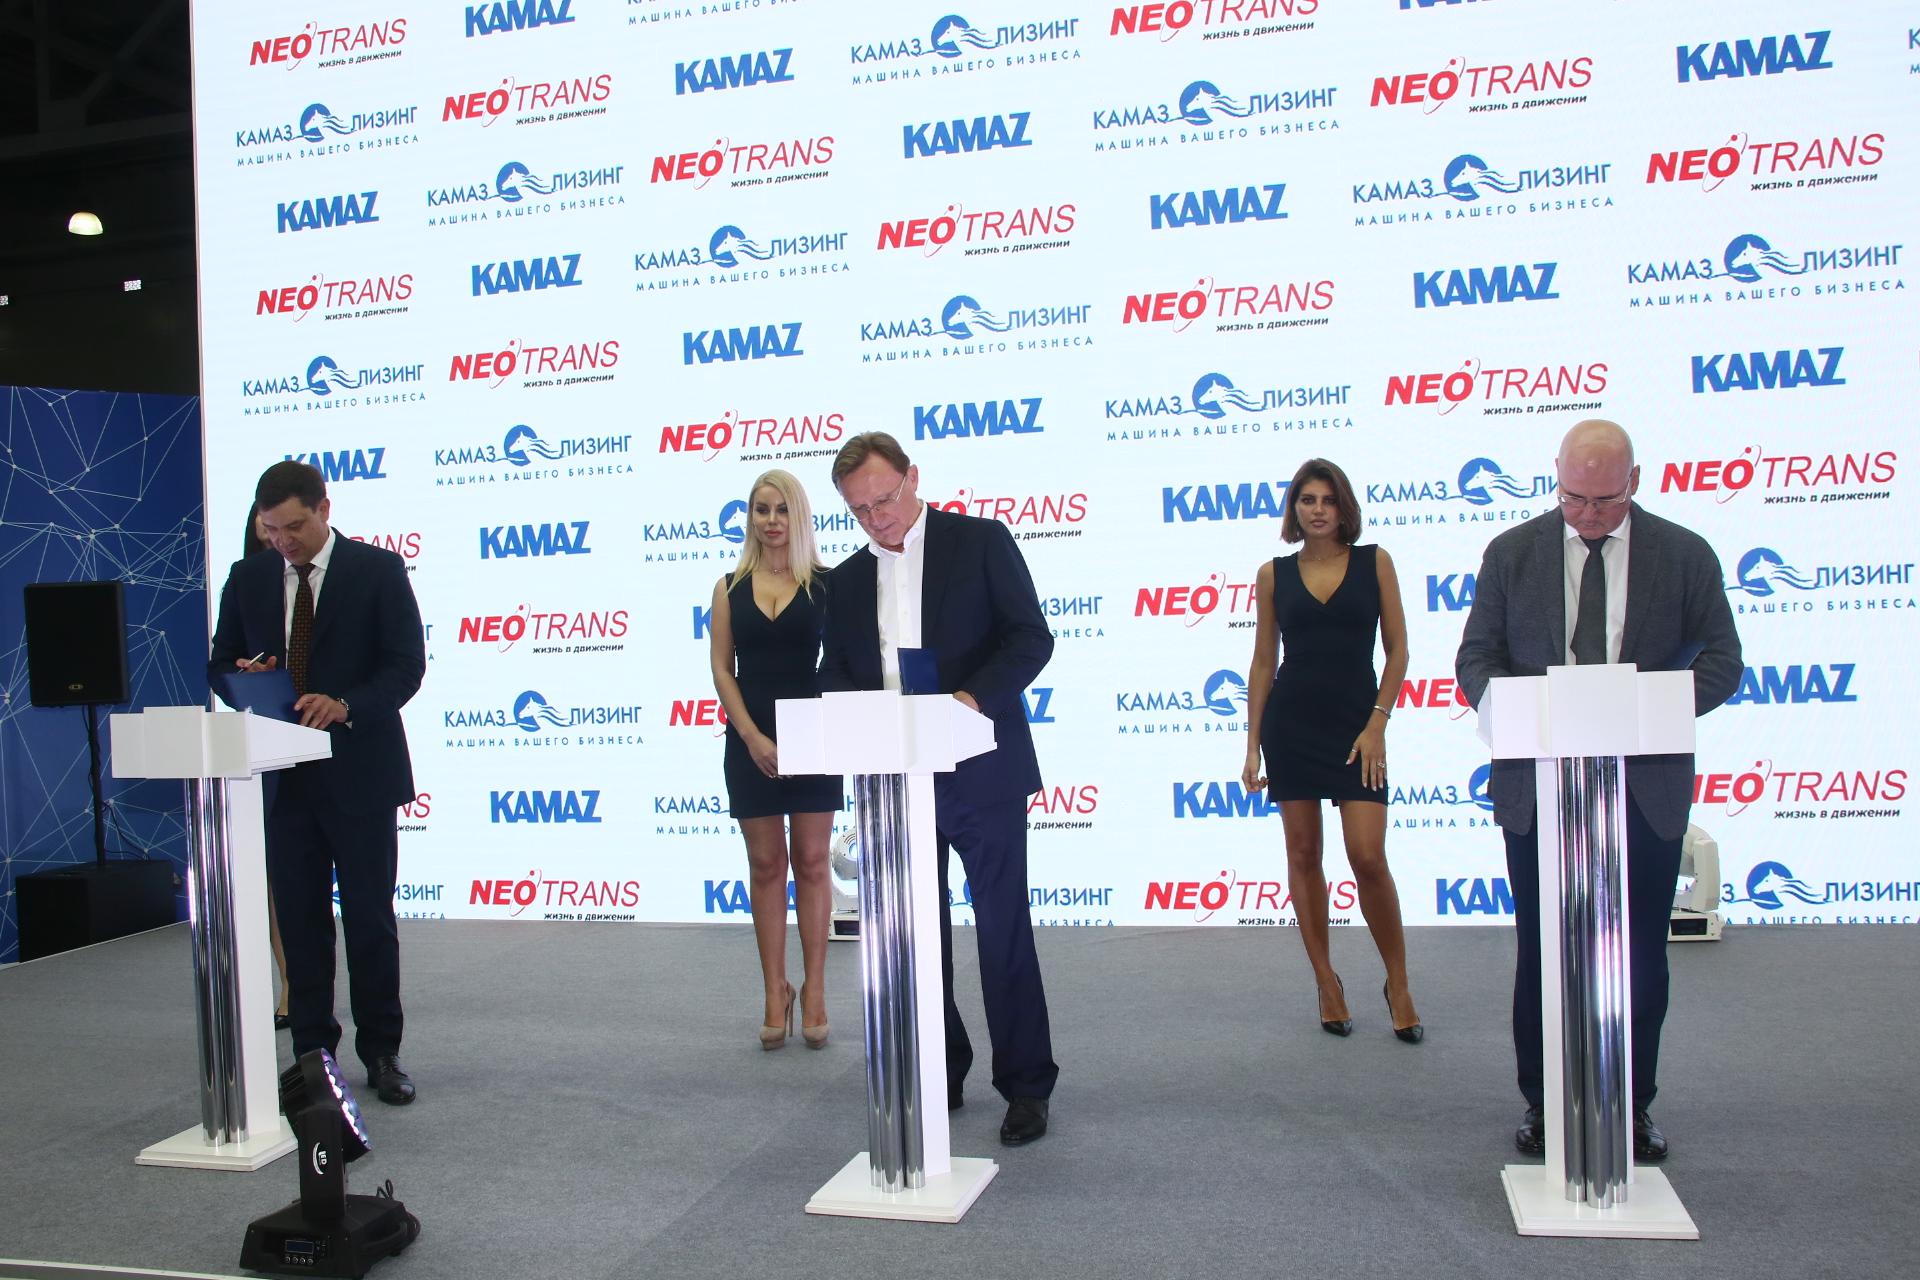 «КАМАЗ» поставит 500 тягачей в лизинг компании «НЕО ТРАНС»